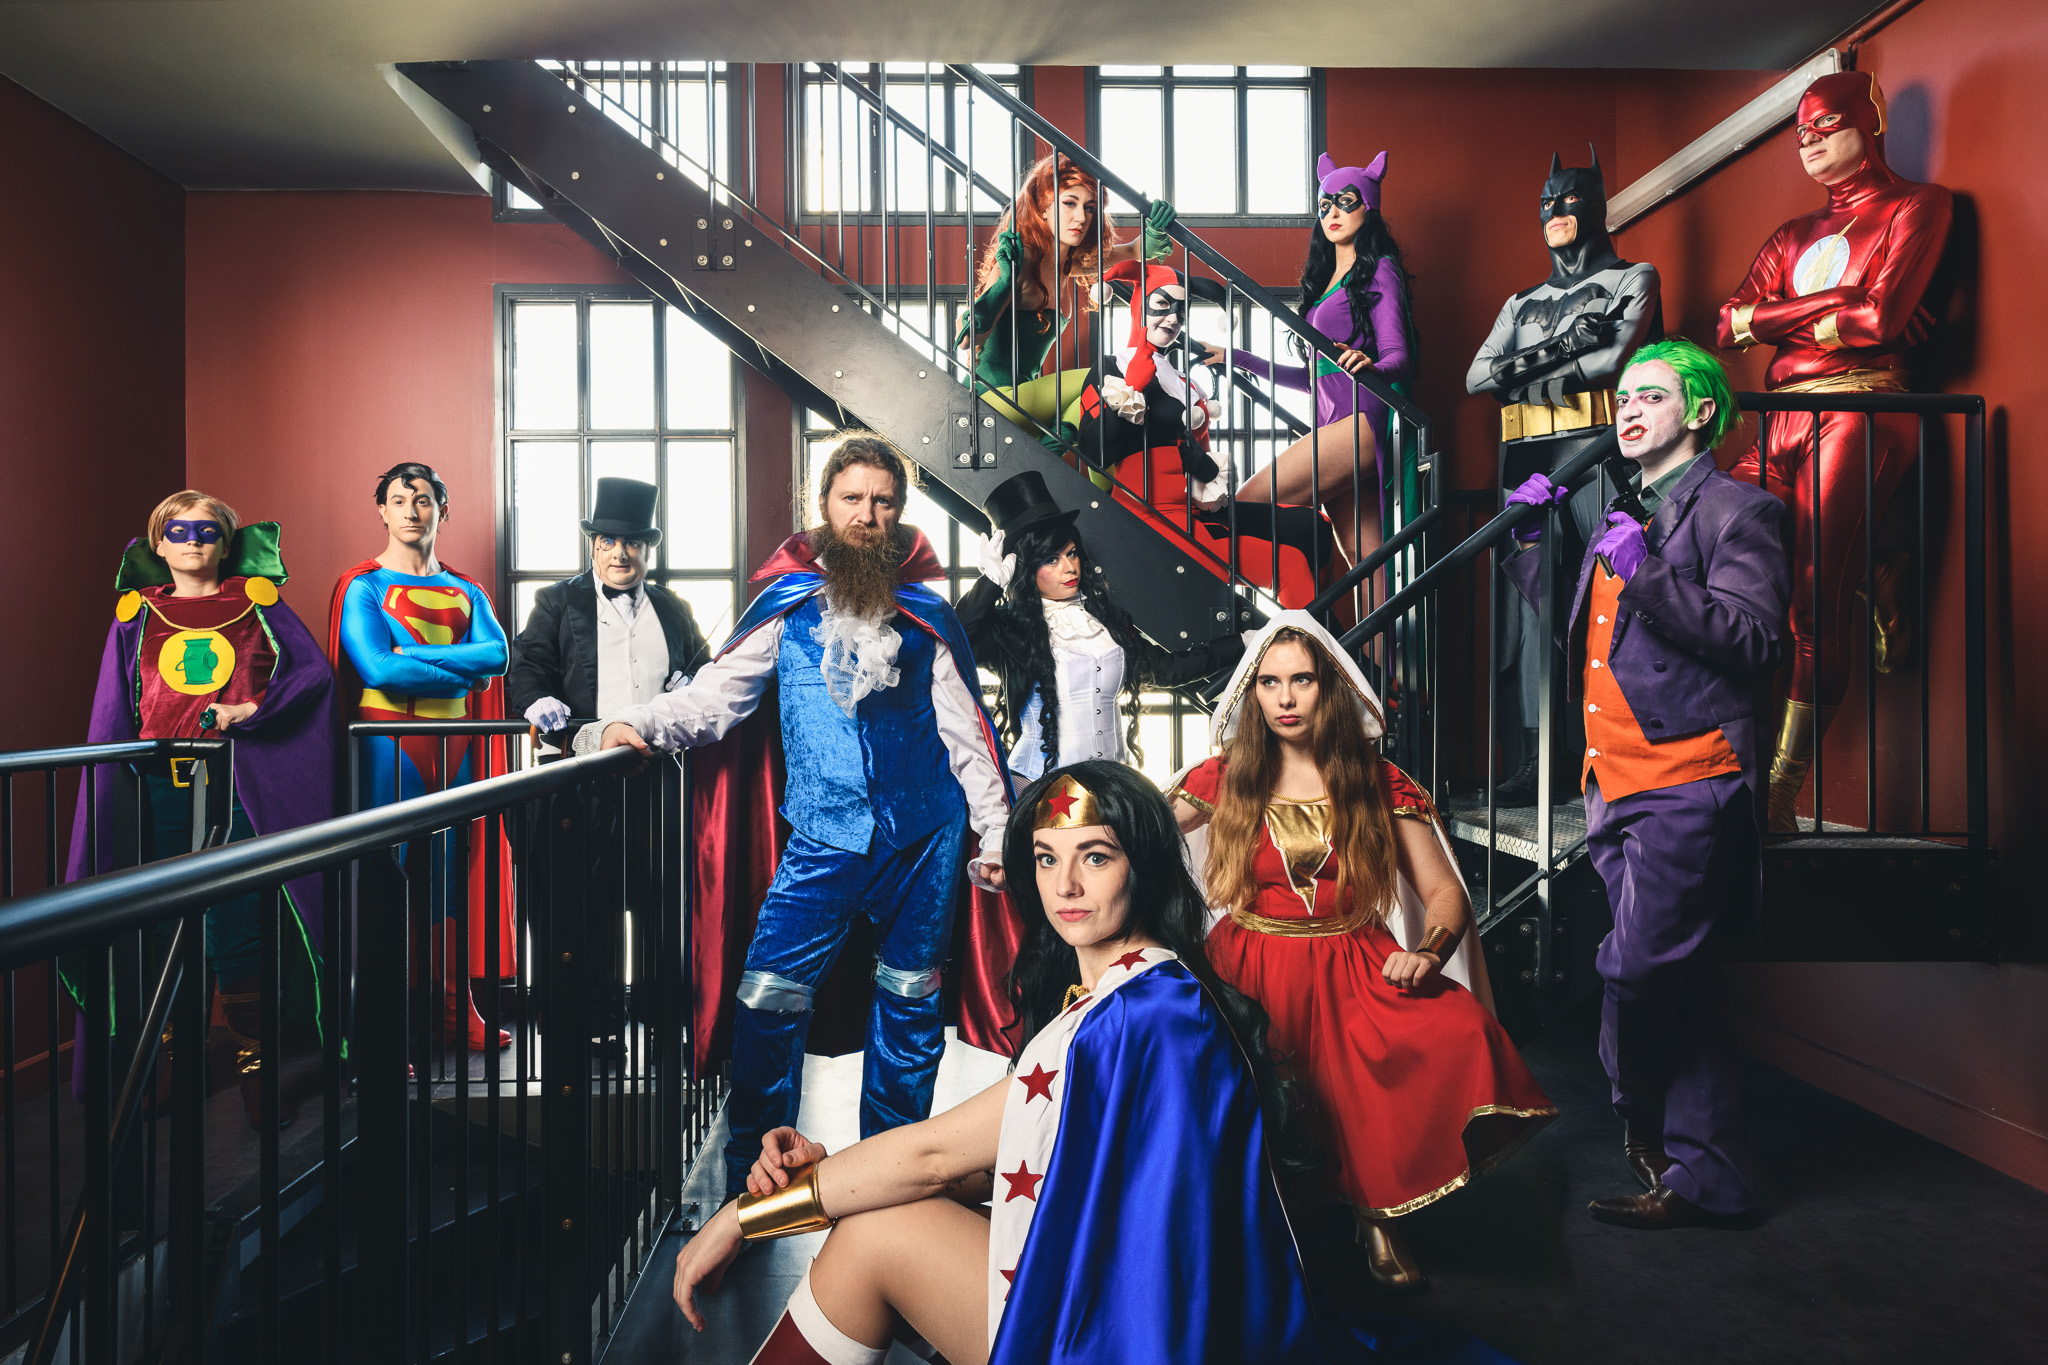 Aurélien AUDY - Photographe Lyon - book cosplay projet perso TNP